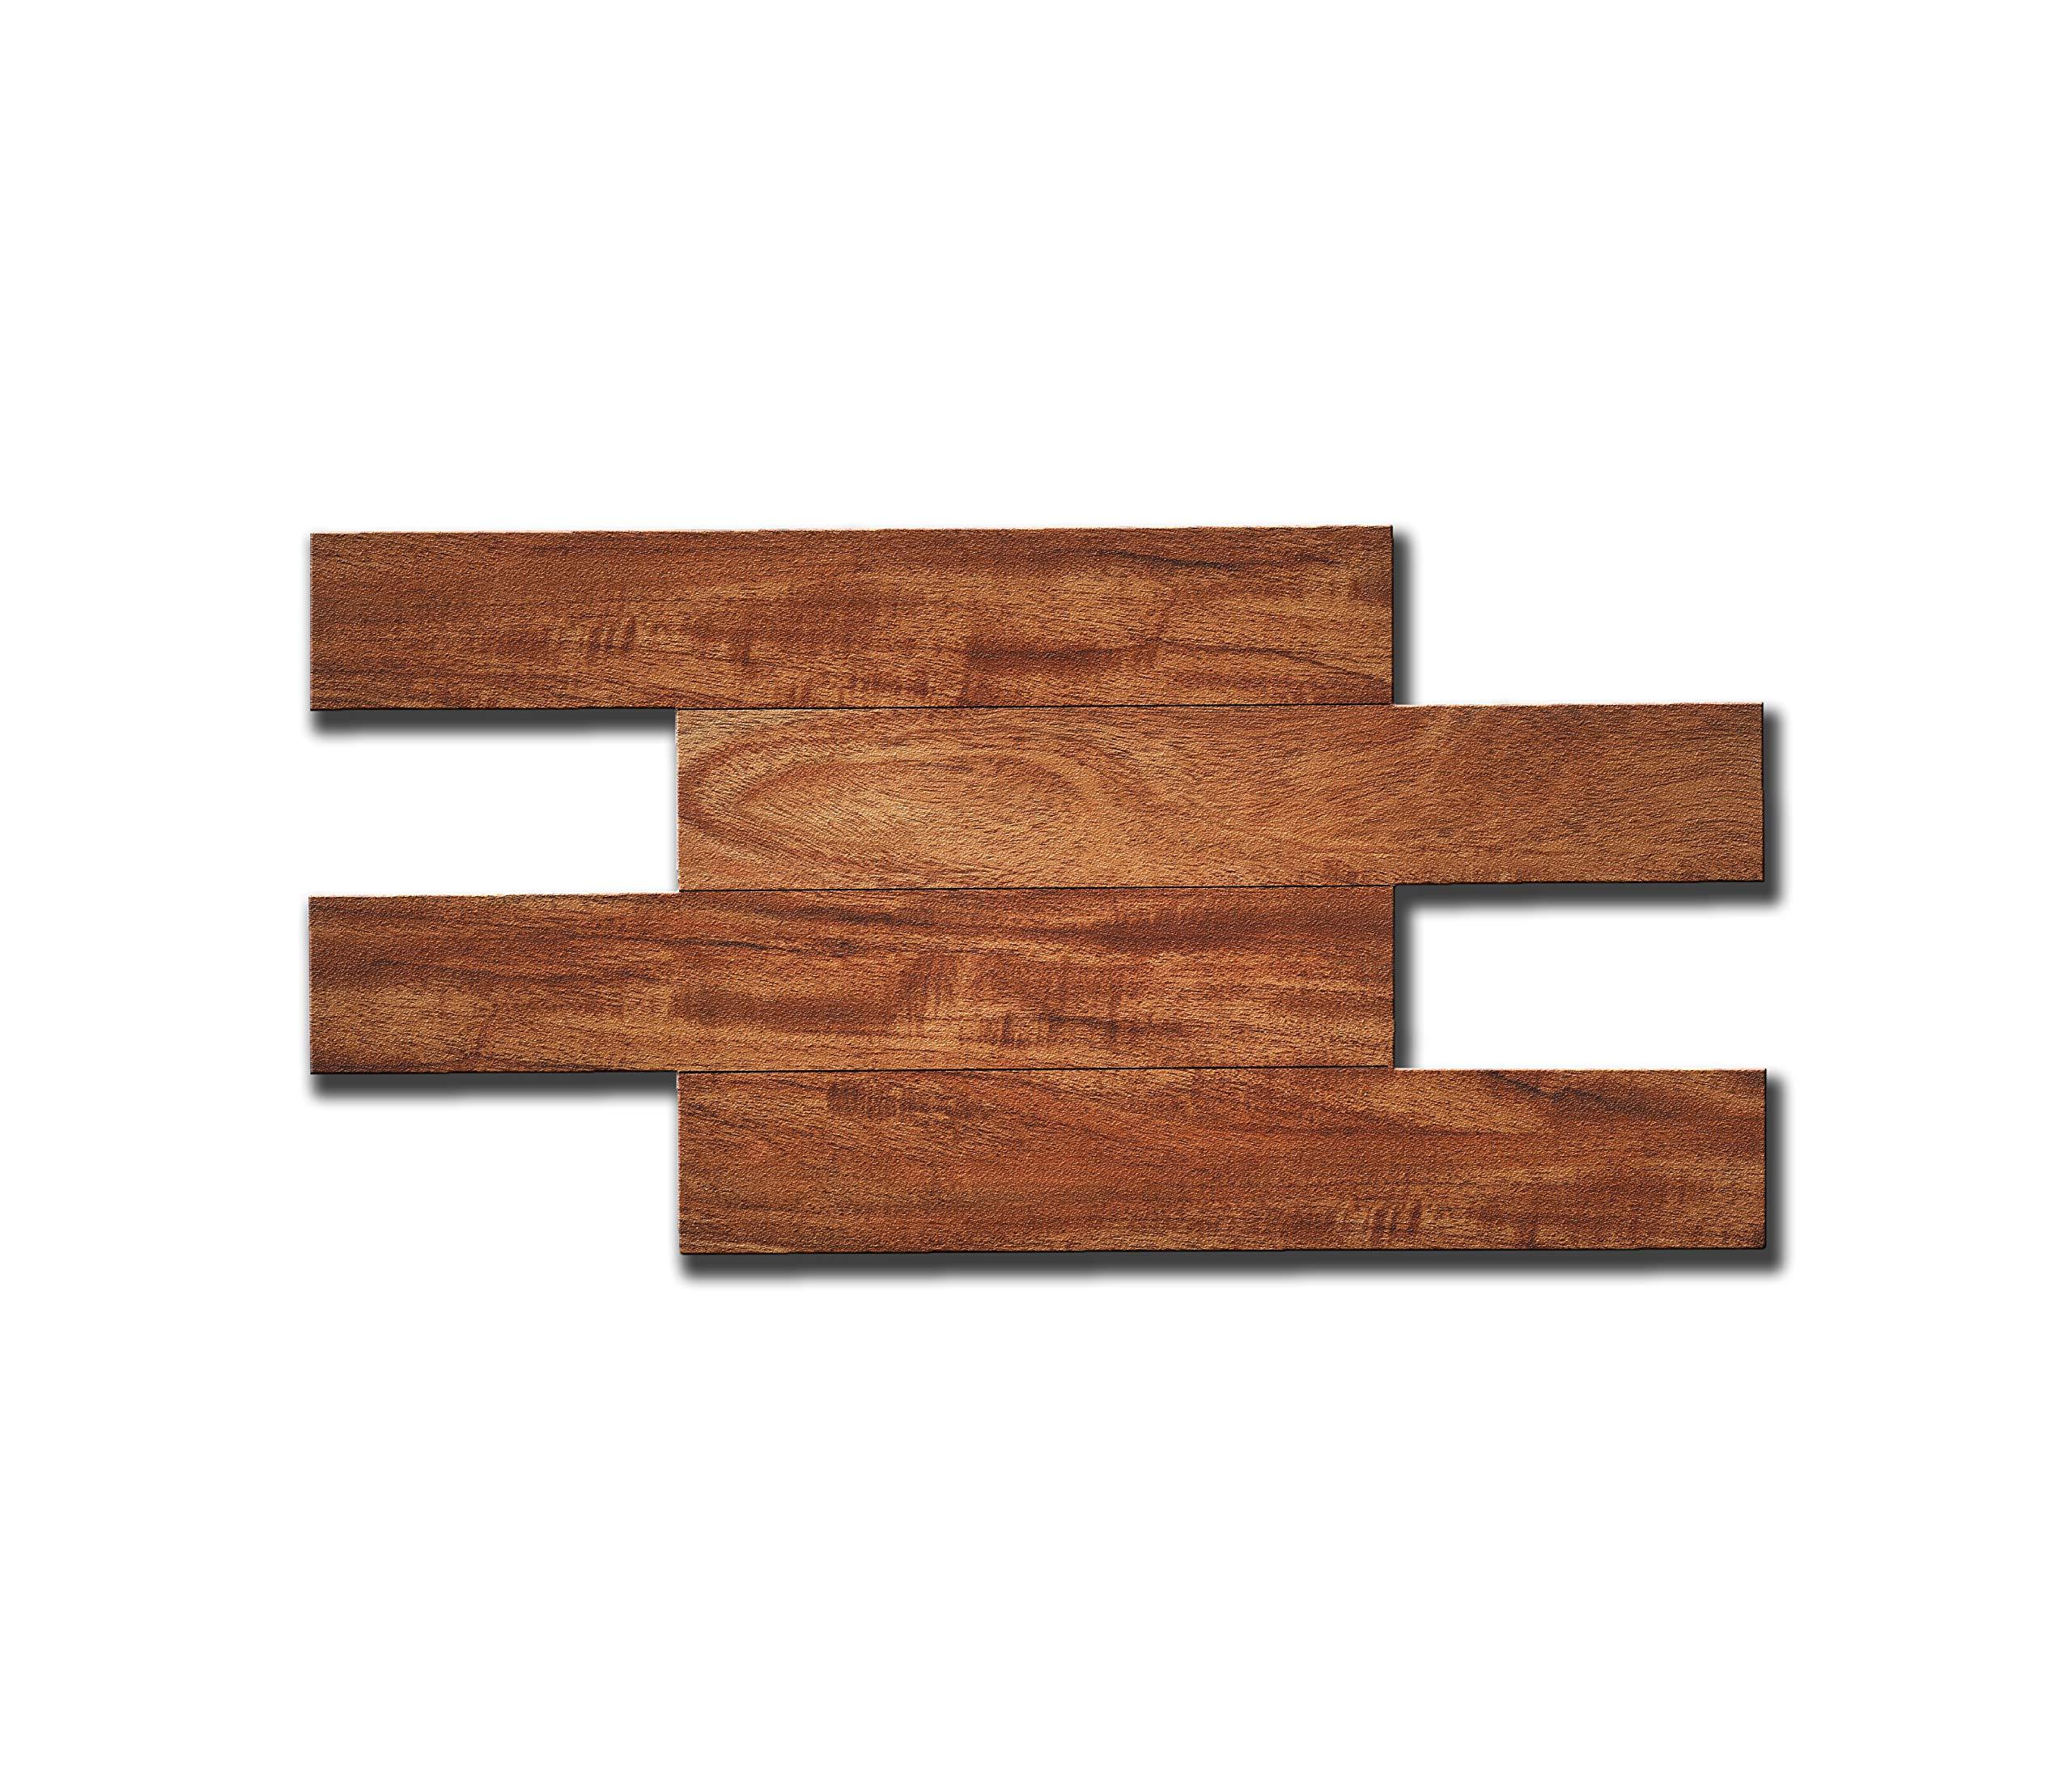 Artesania Muro Peel and Stick Bathroom Backsplash Tiles, Wood Grain, Adhesive, Fire Proof, Water Proof, Anti-Moldy, 13.4 inch x 6.7 inch per Tile, Pack of 22 Tiles by Artesania Muro